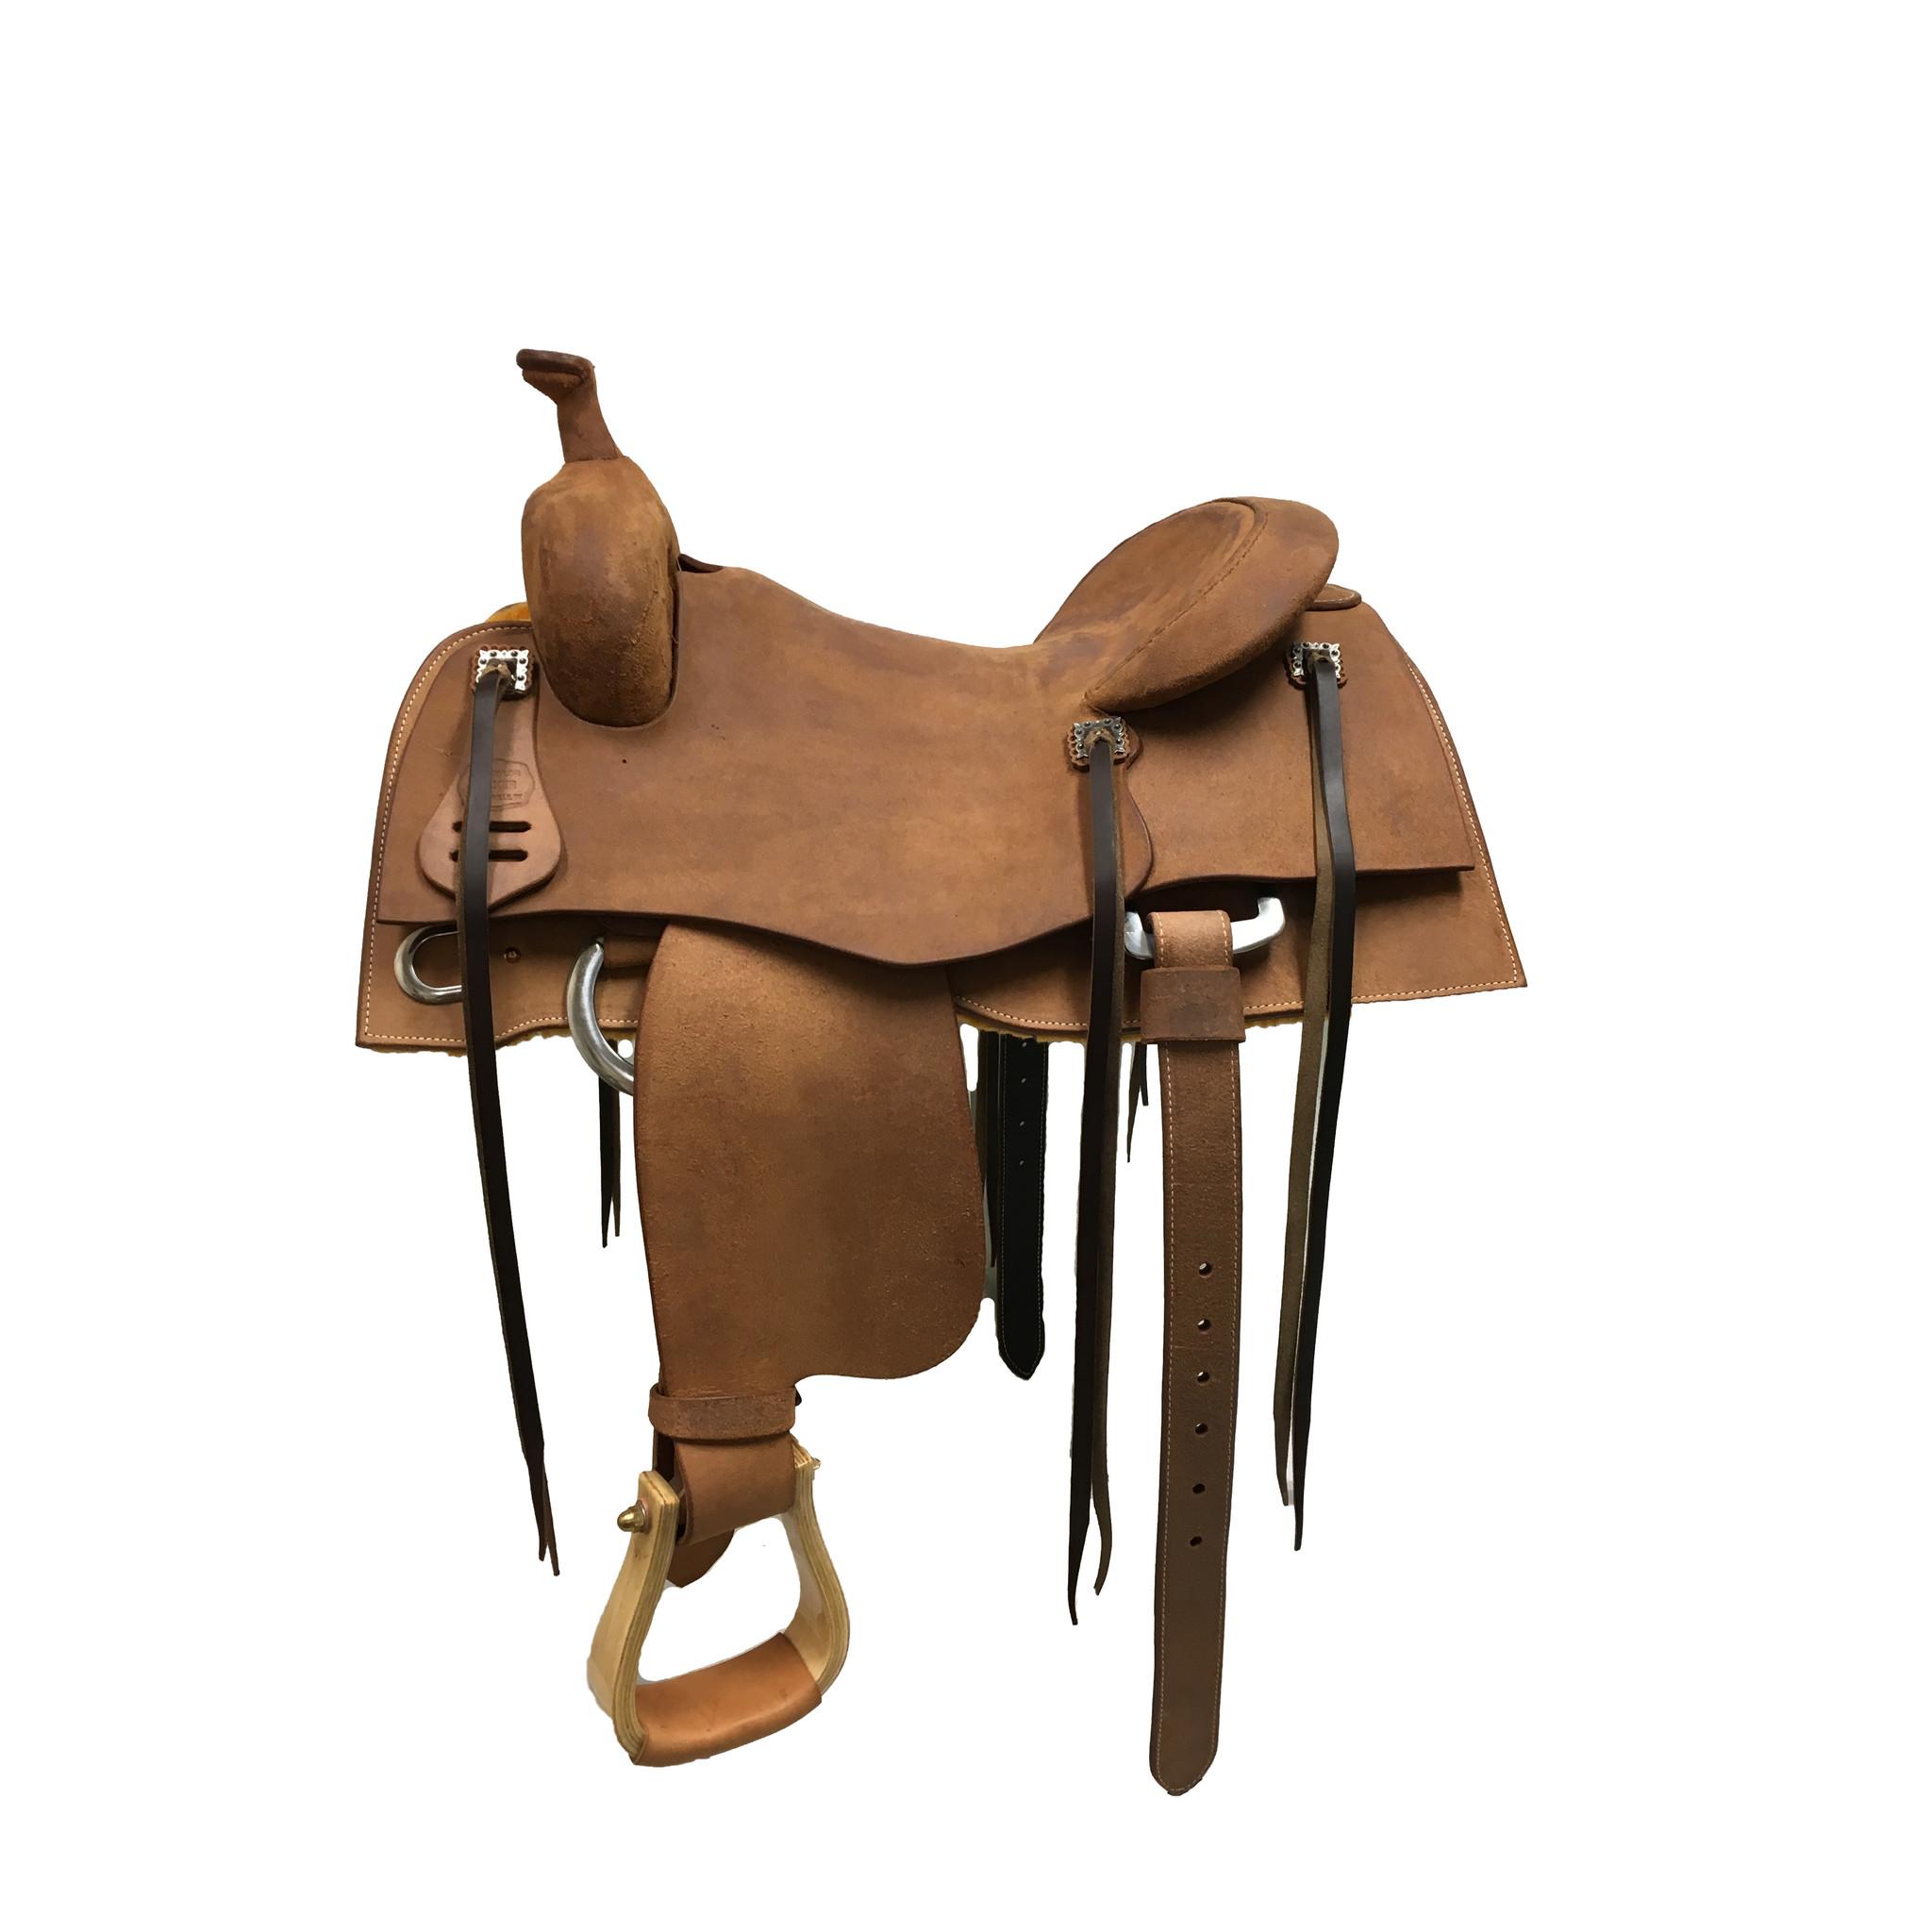 Jim Taylor Custom saddle Jim taylor Heritage rough out trainer